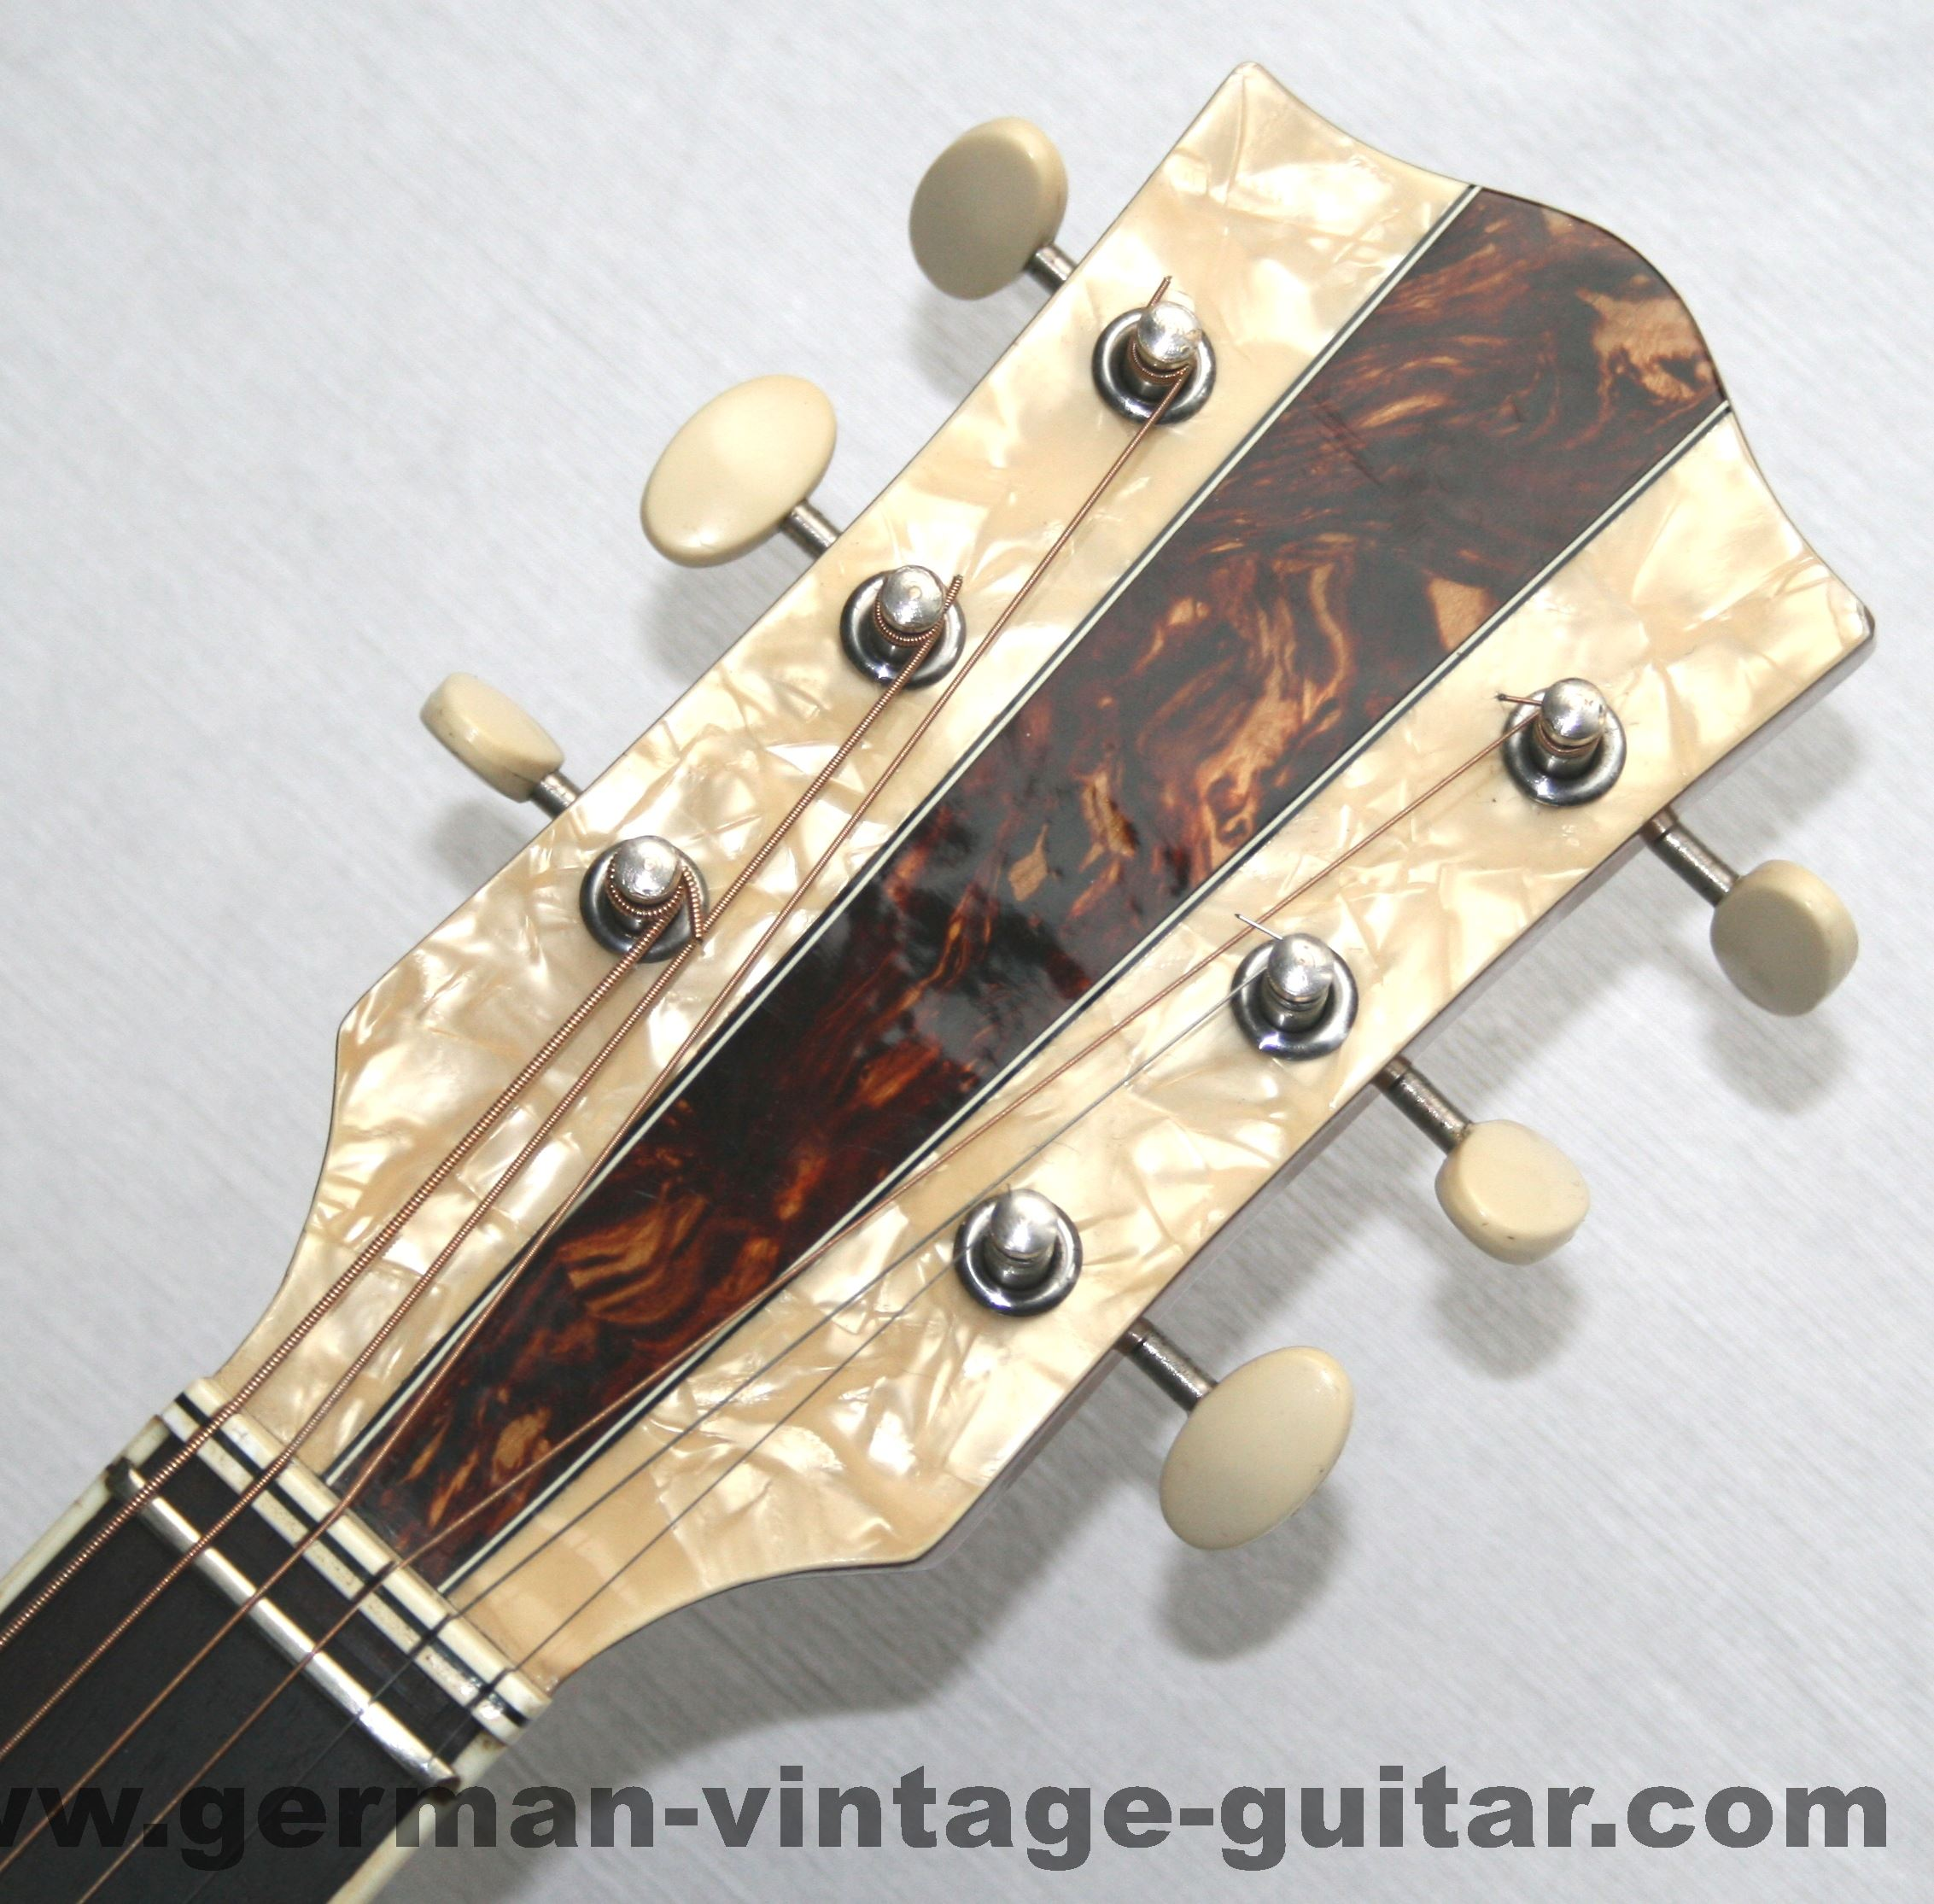 https://german-vintage-guitar.com/media/image/83/47/66/462-H-fner-4550S-1959-17.jpg